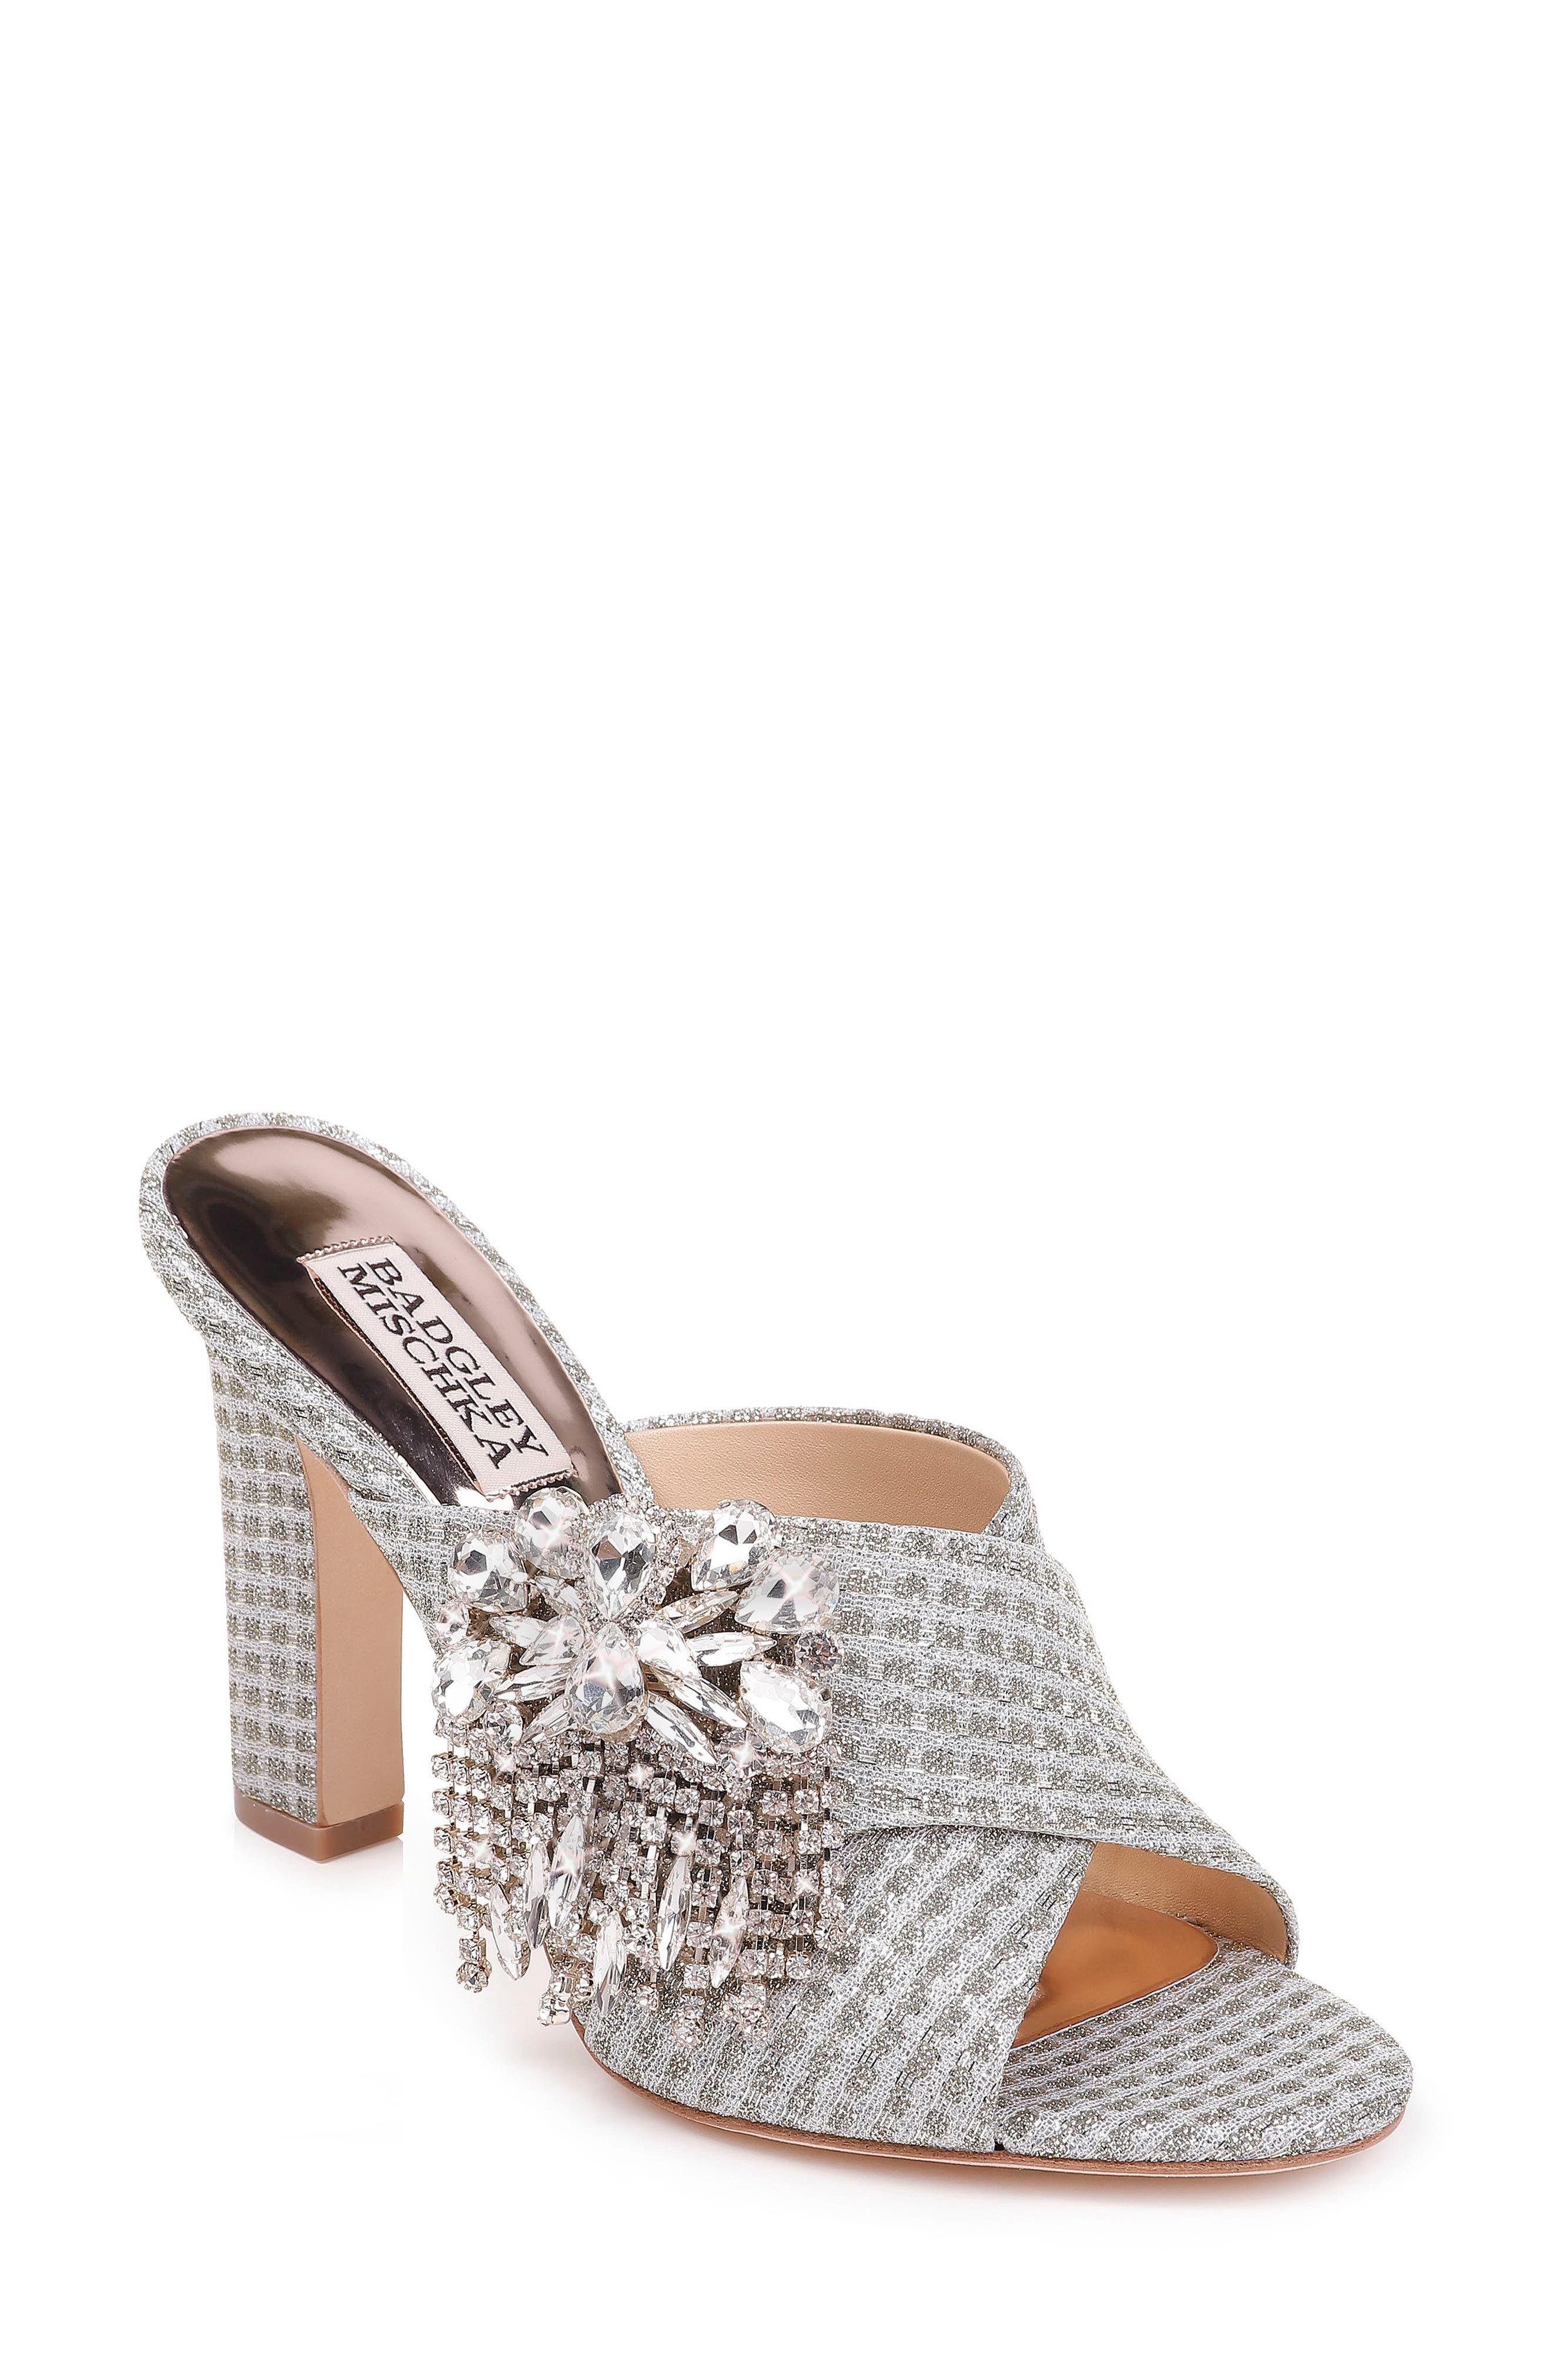 Badgley Mischka Farrah Sandal in Platino Glitter Fabric